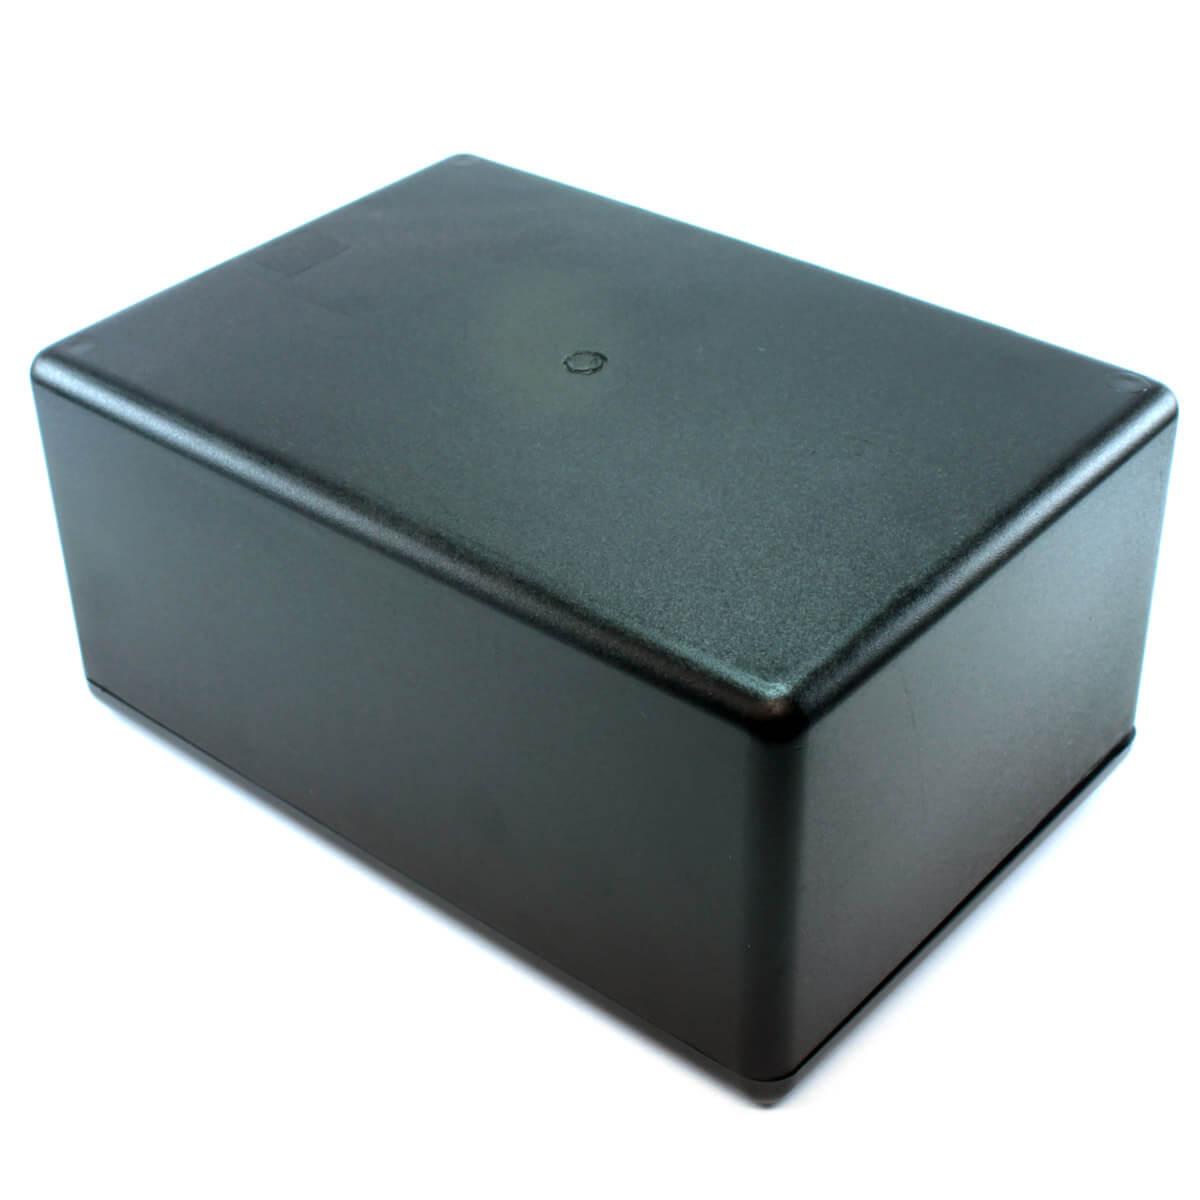 Caixa Patola PB-150 - 150x214x100mm